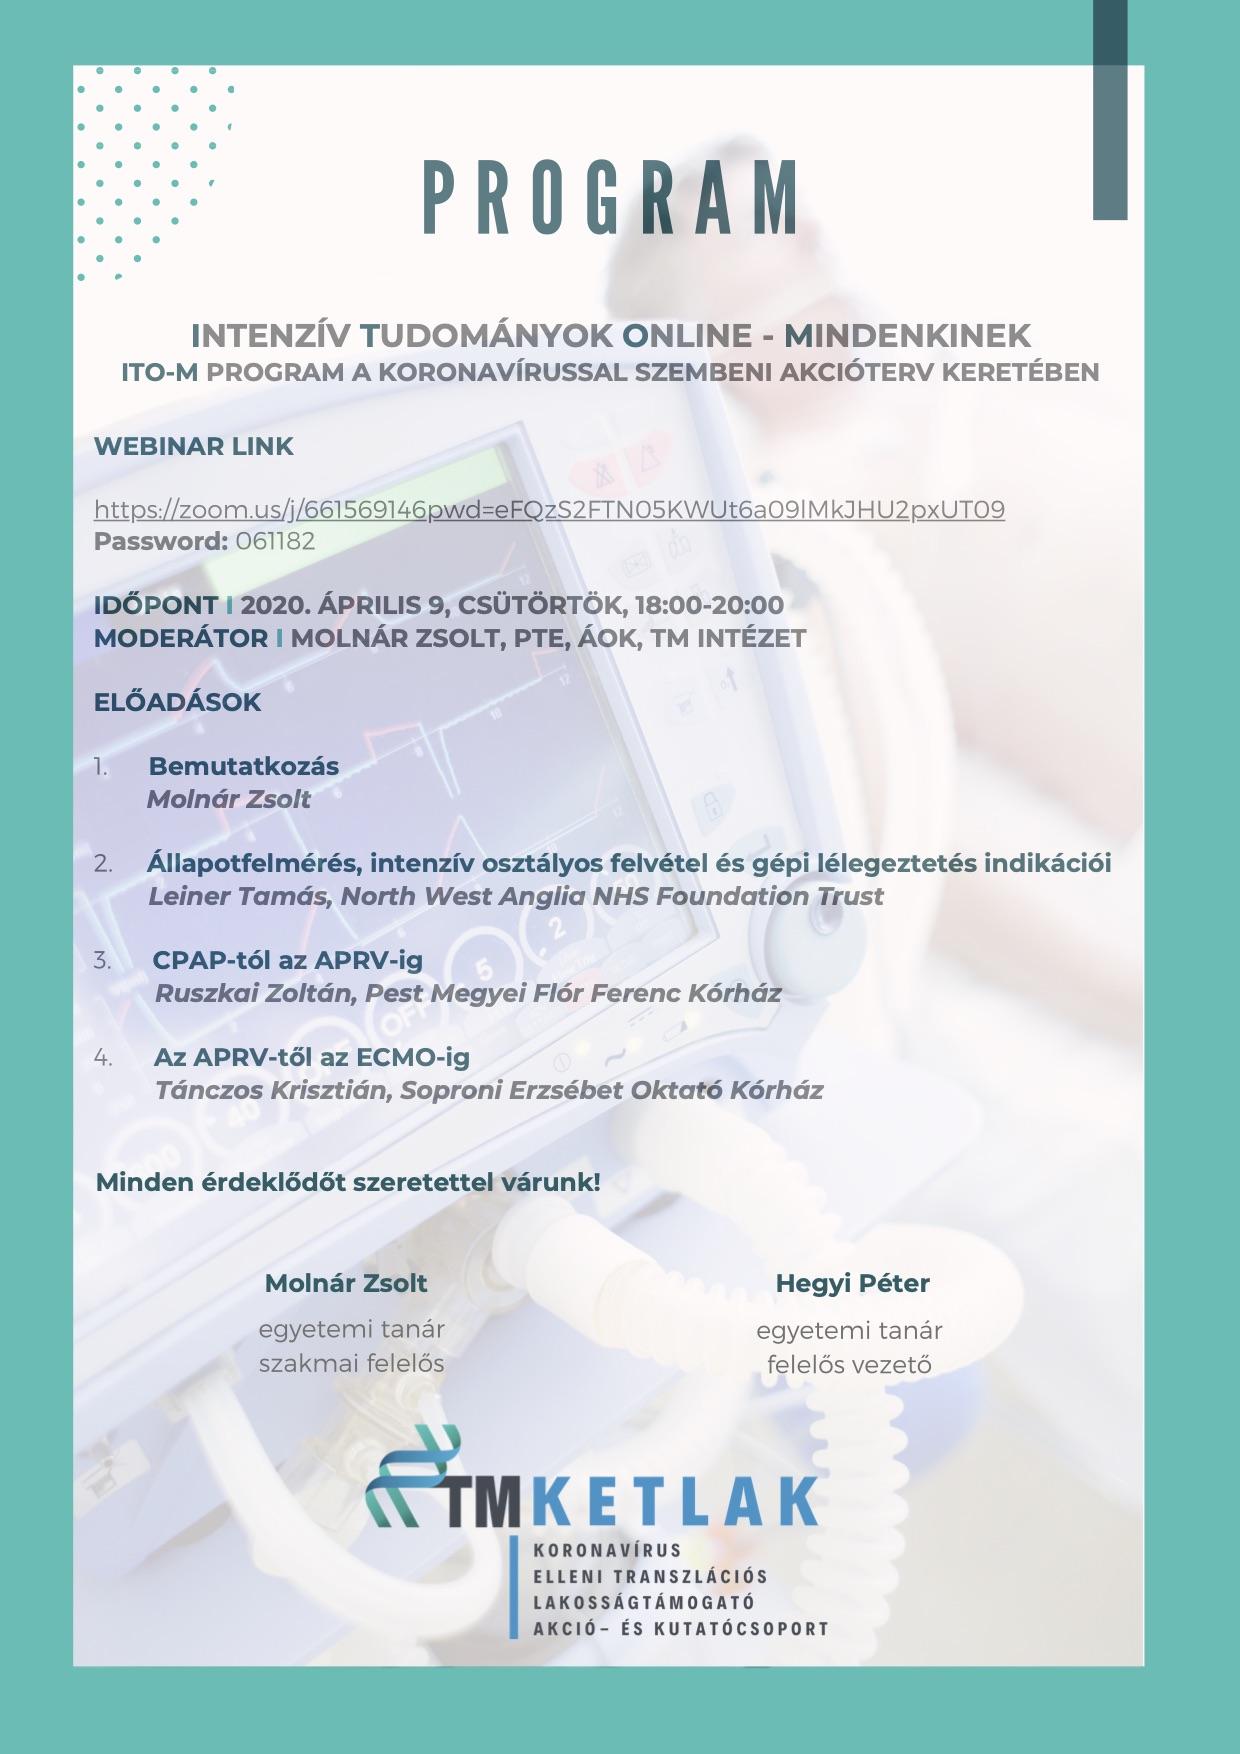 ITO-M program